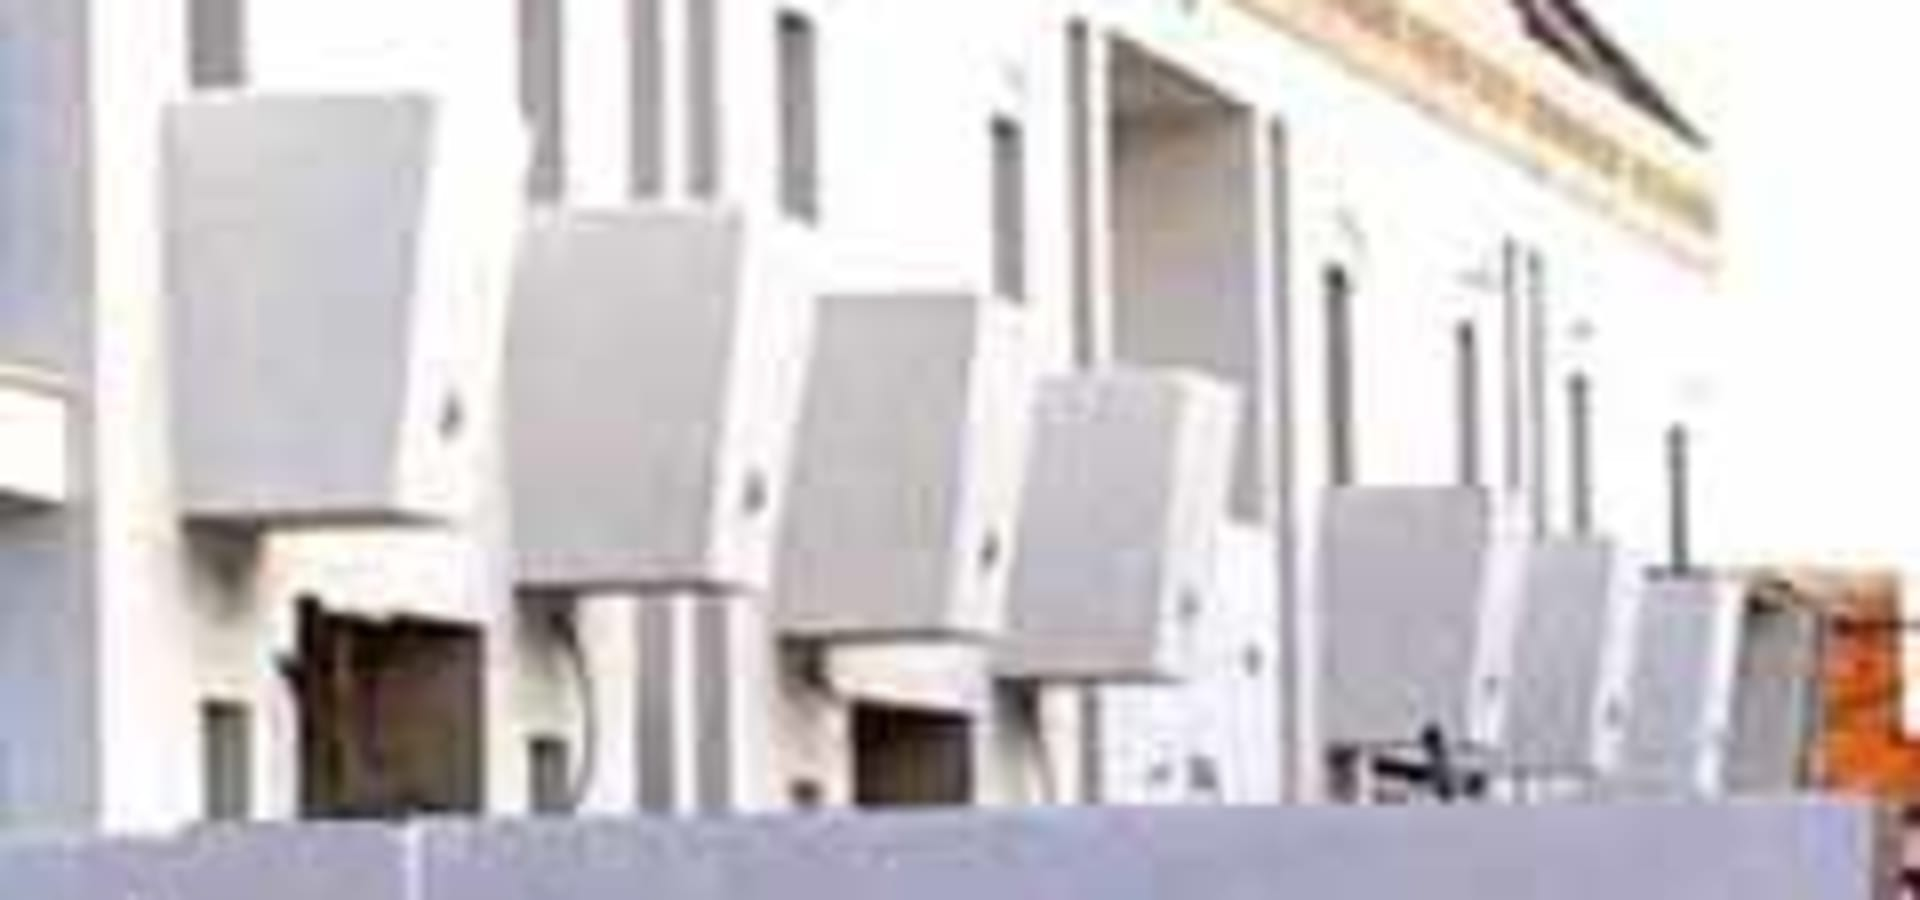 Estudio de arquitectura arquitectos en barcelona homify - Estudio de arquitectura barcelona ...